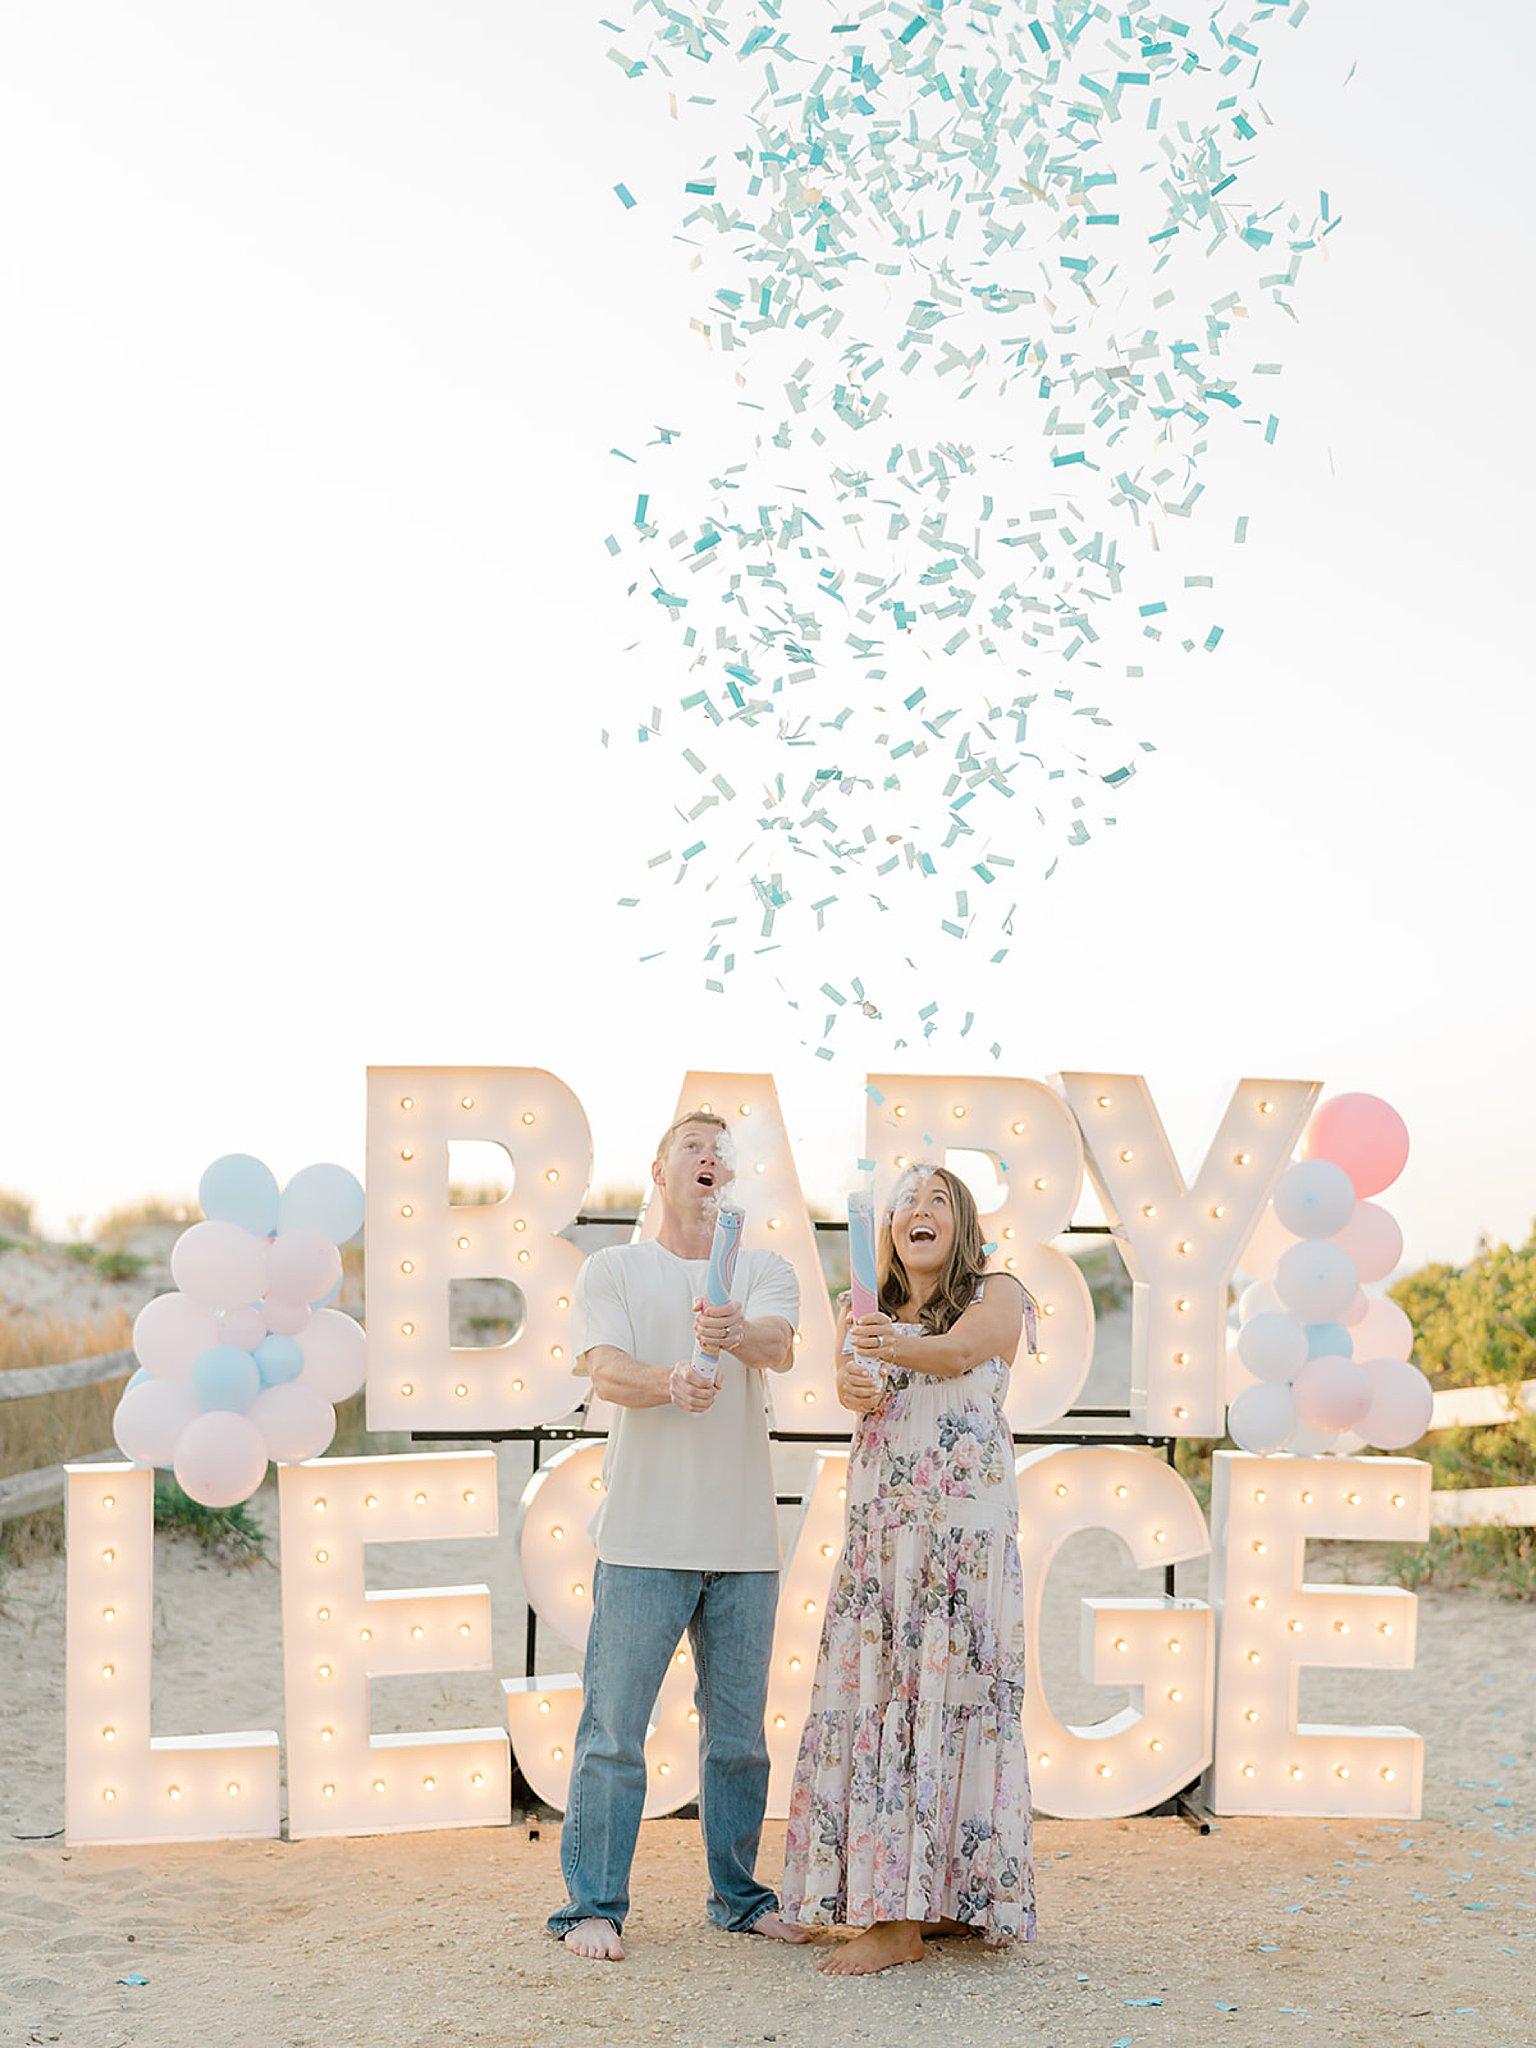 Ocean City NJ Gender Reveal Pregnancy Photography by Magdalena Studios 0005 1